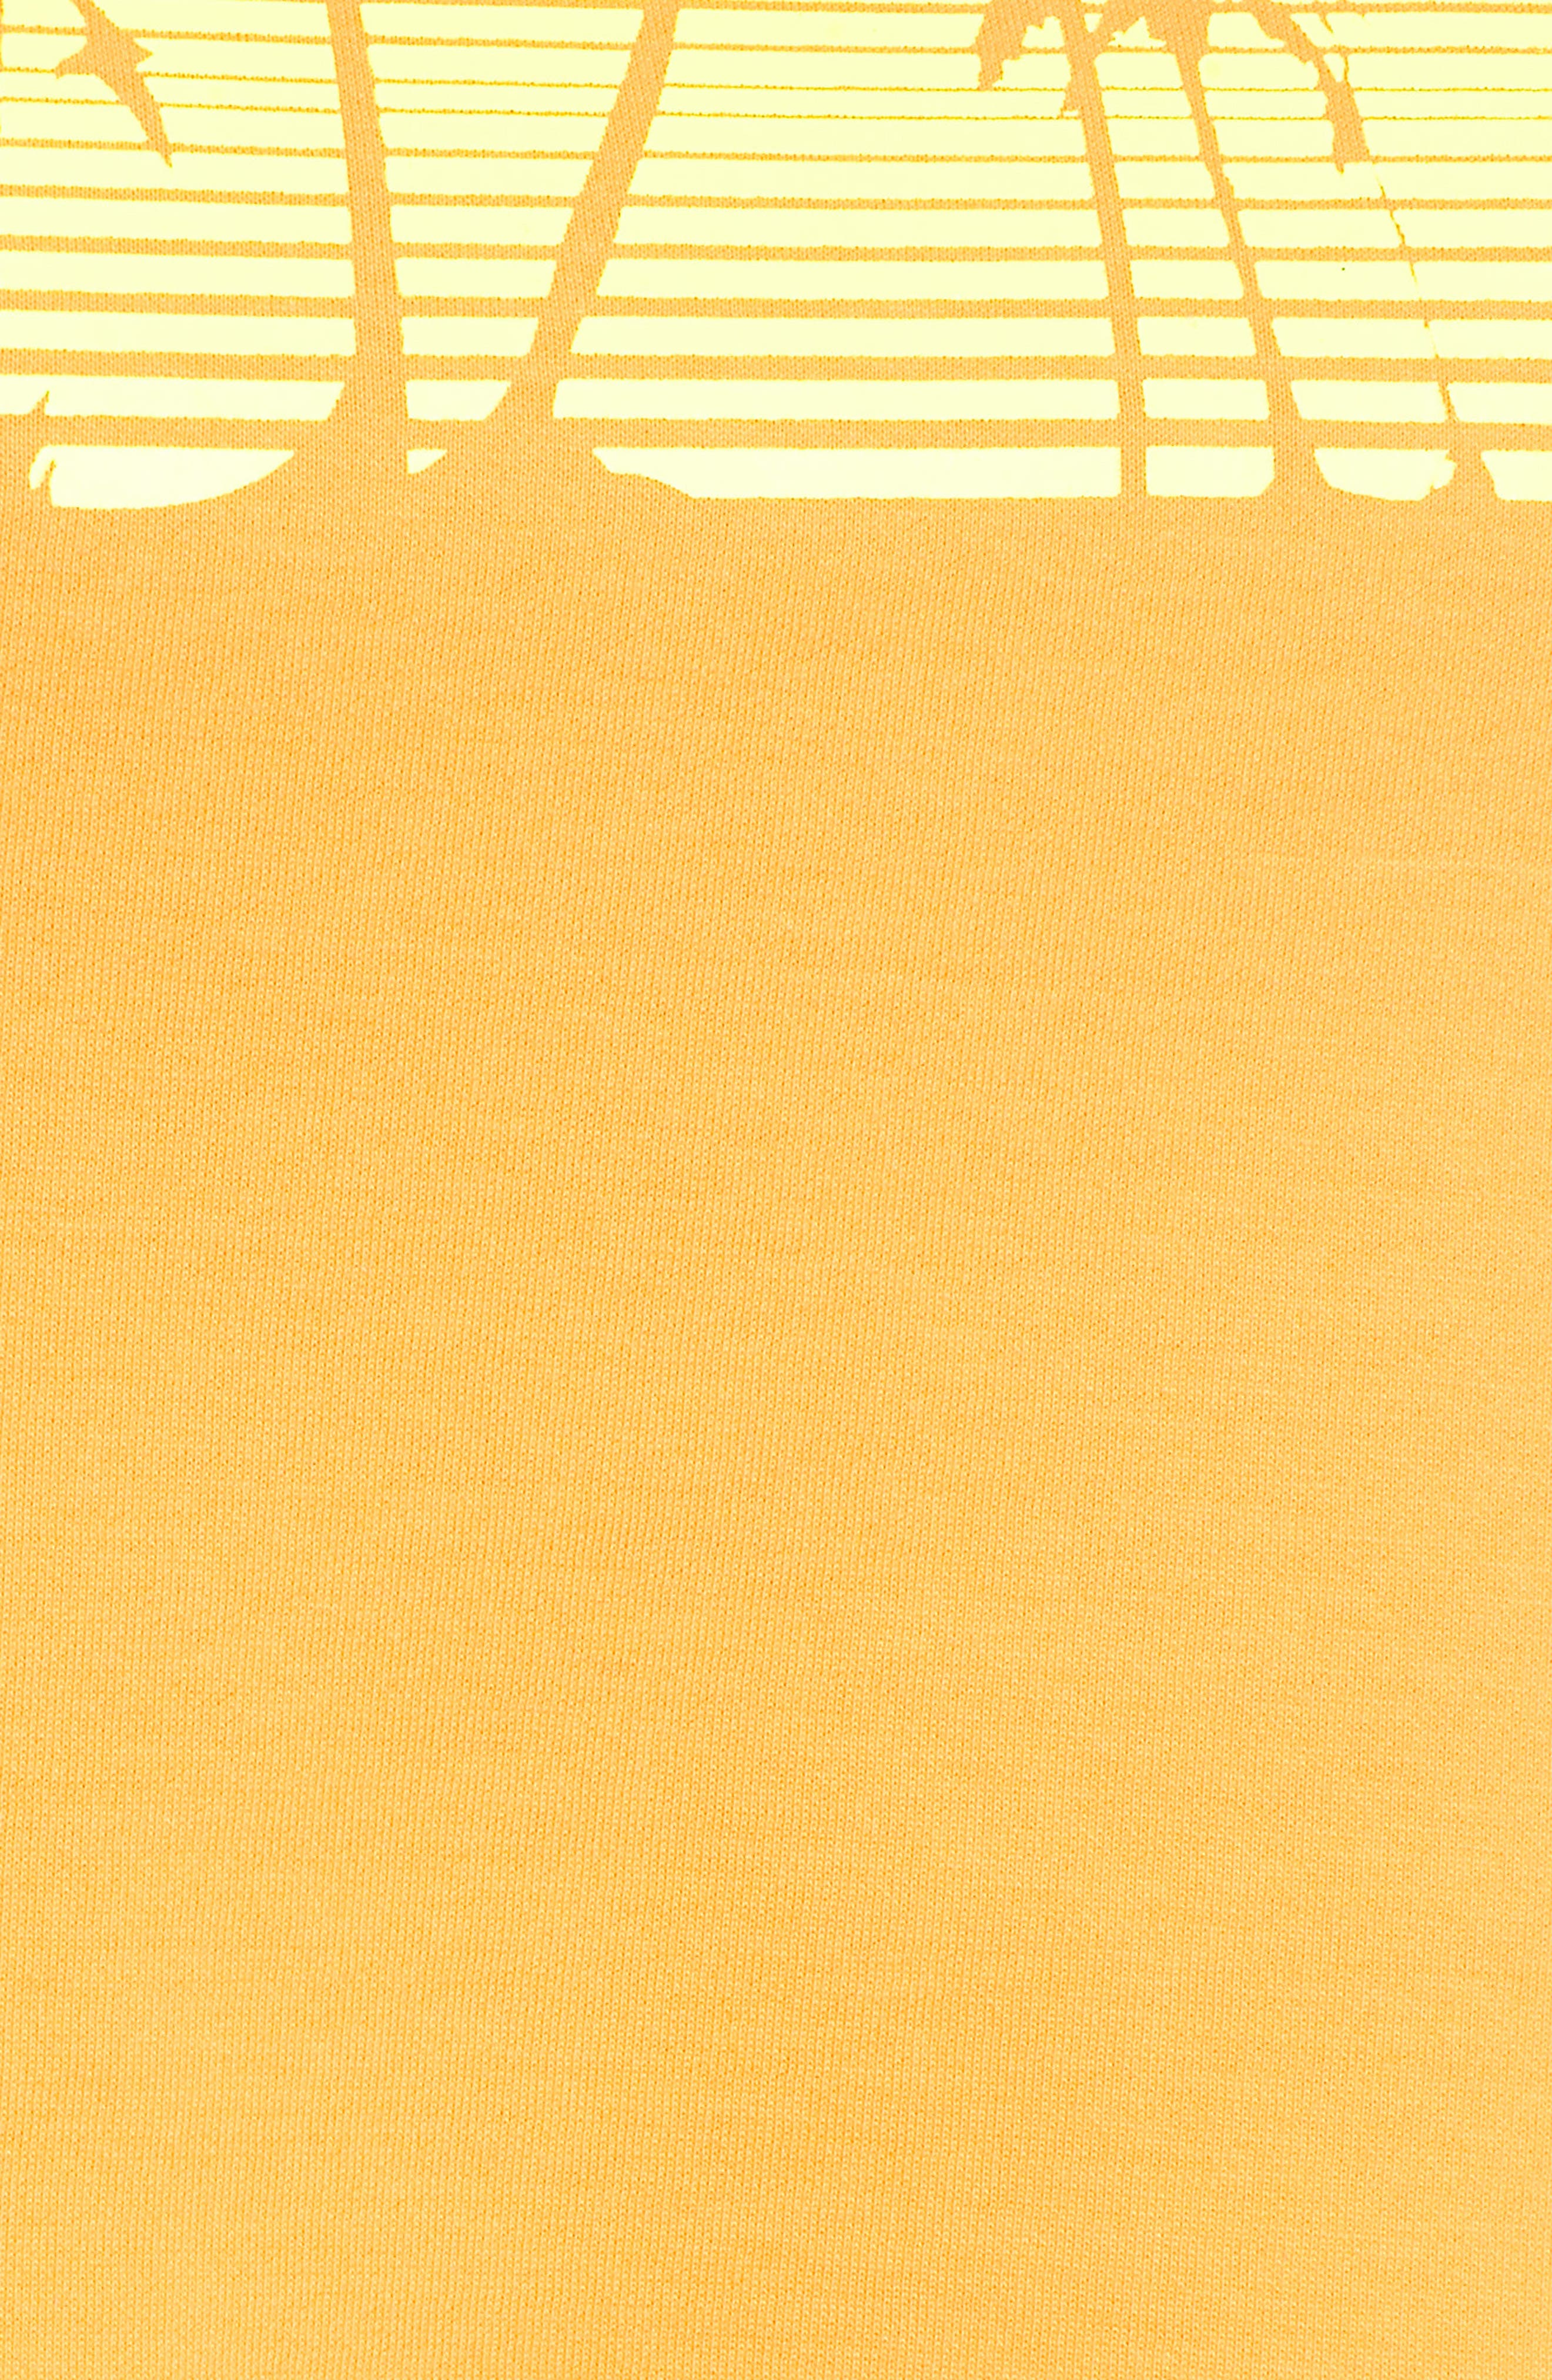 FENTY PUMA by Rihanna Crop Top,                             Alternate thumbnail 6, color,